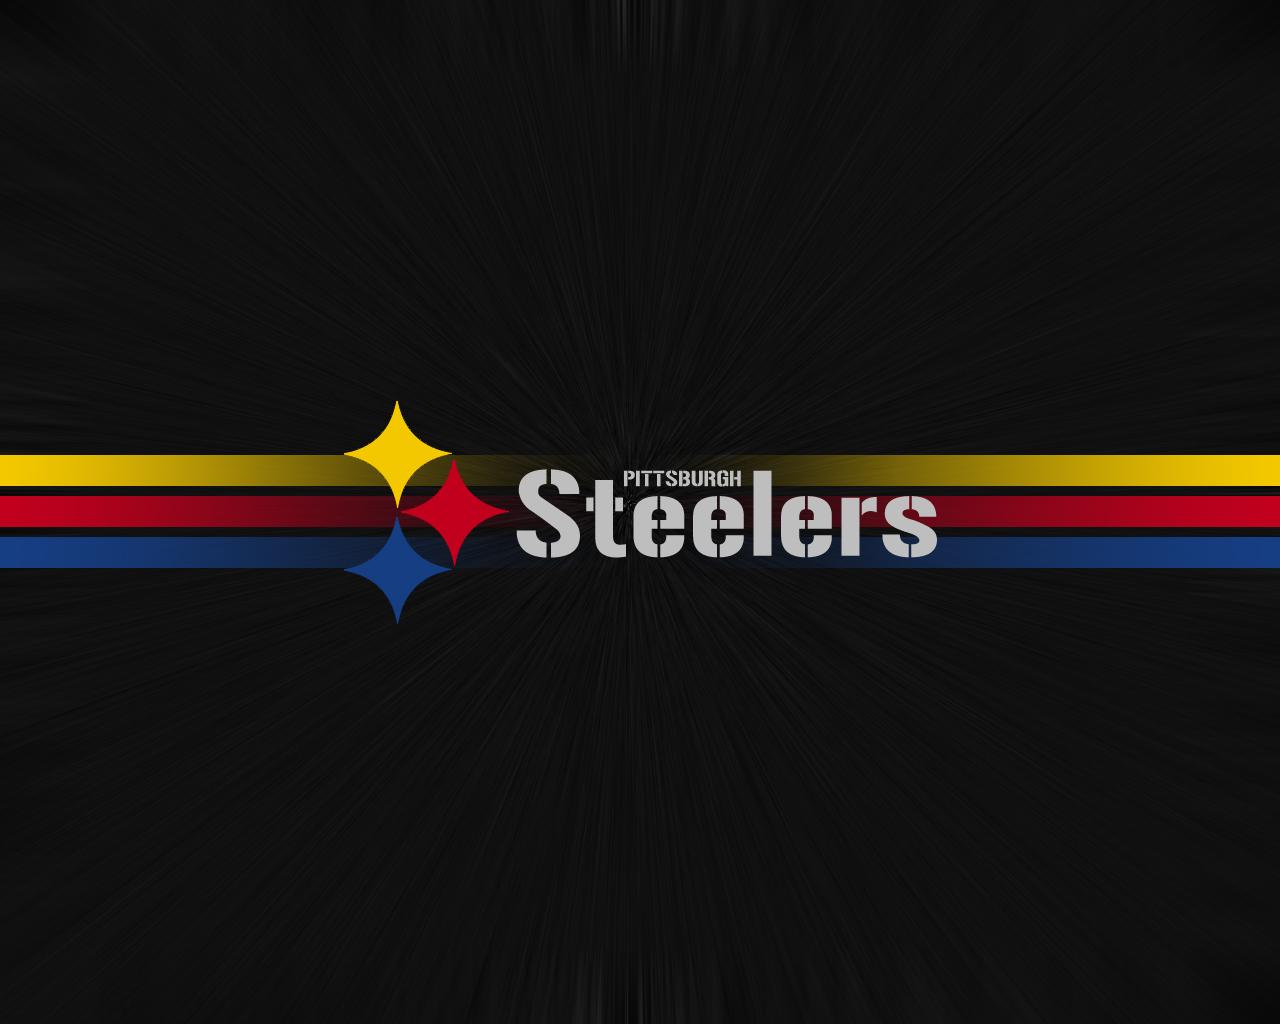 Steelers Wallpaper Top HD Wallpapers 1280x1024